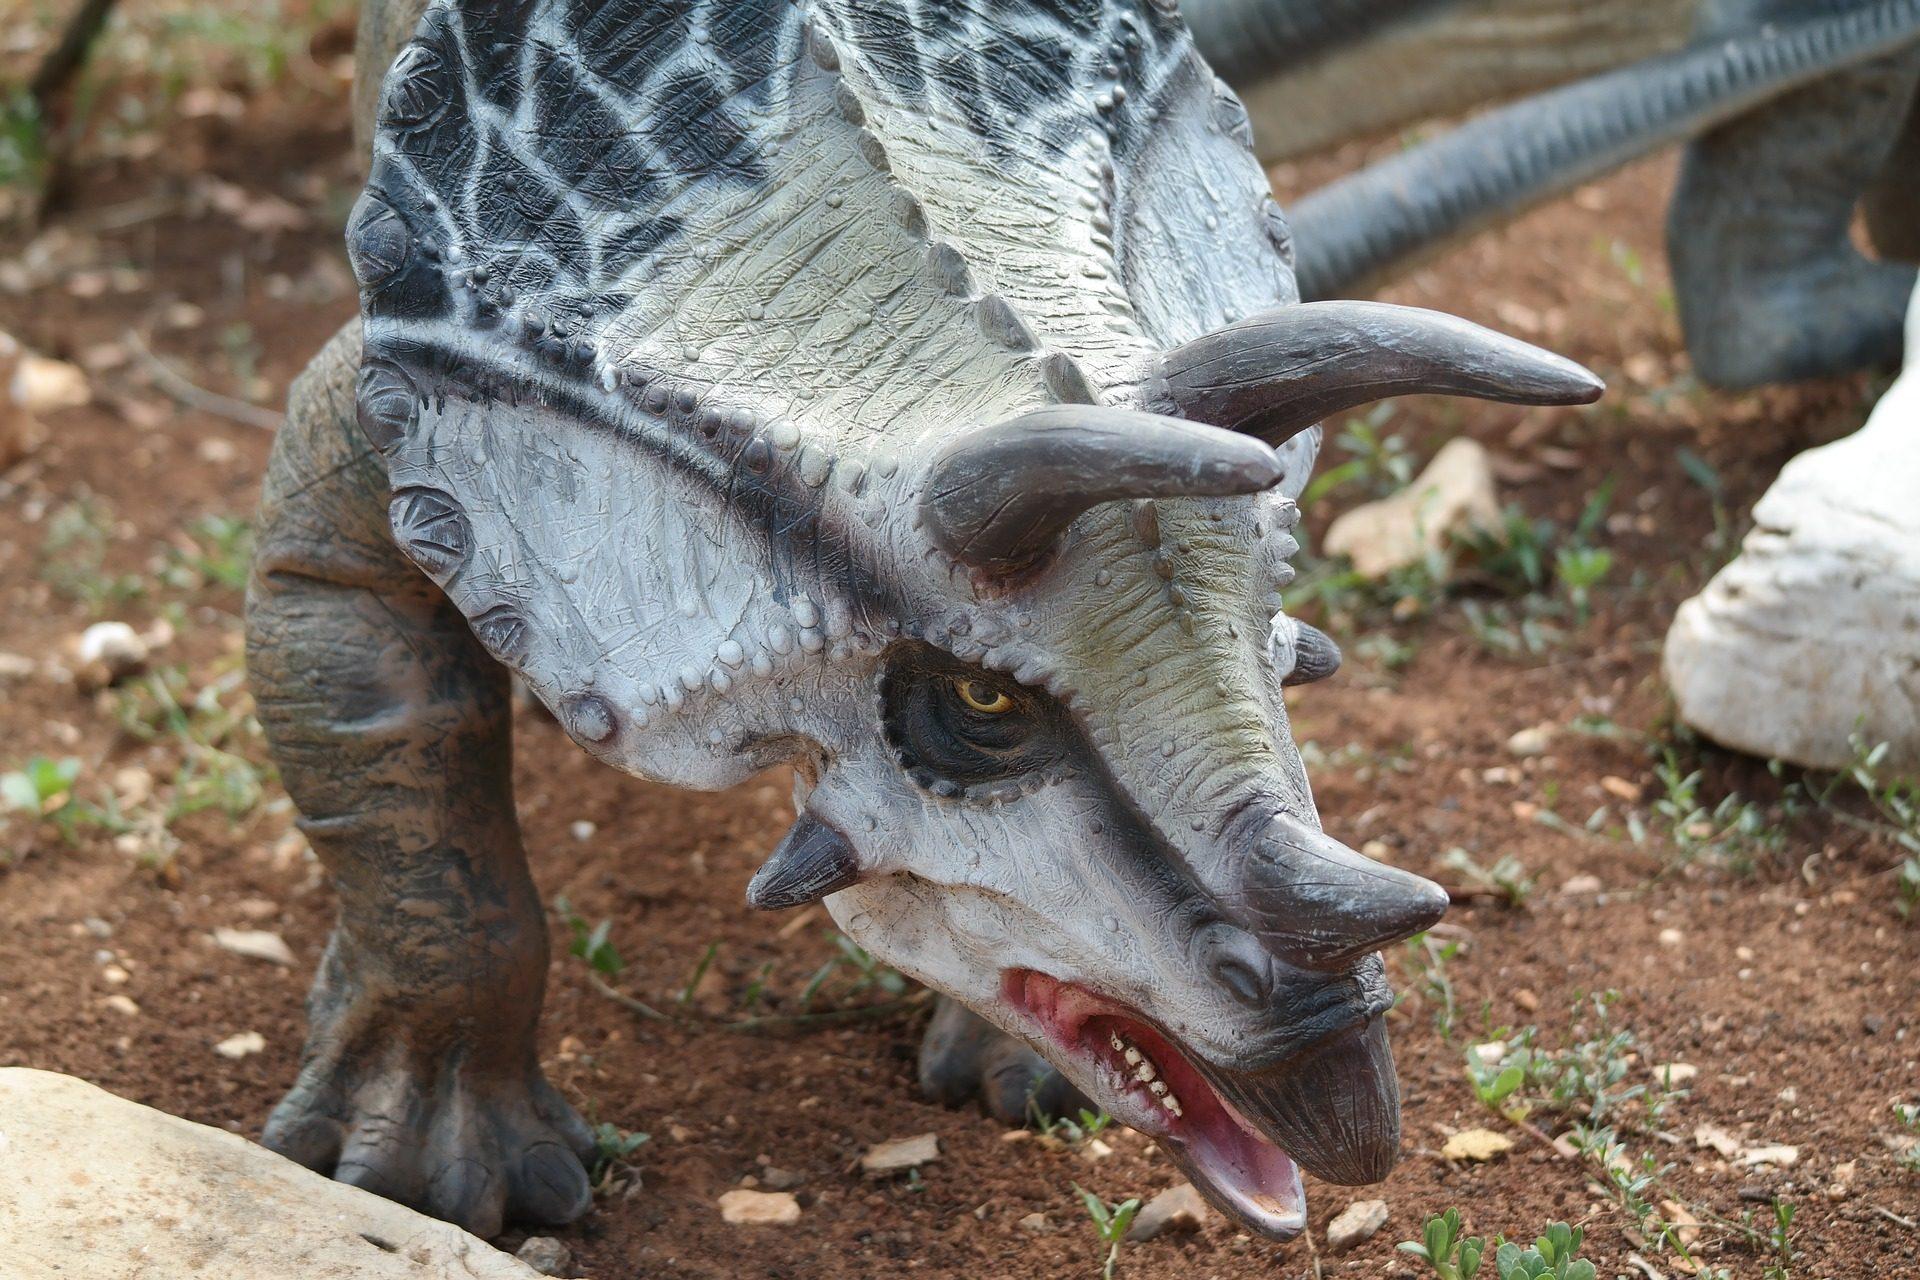 triceratops, Δεινόσαυρος, κέρατα, Παιχνίδι, Σχήμα - Wallpapers HD - Professor-falken.com